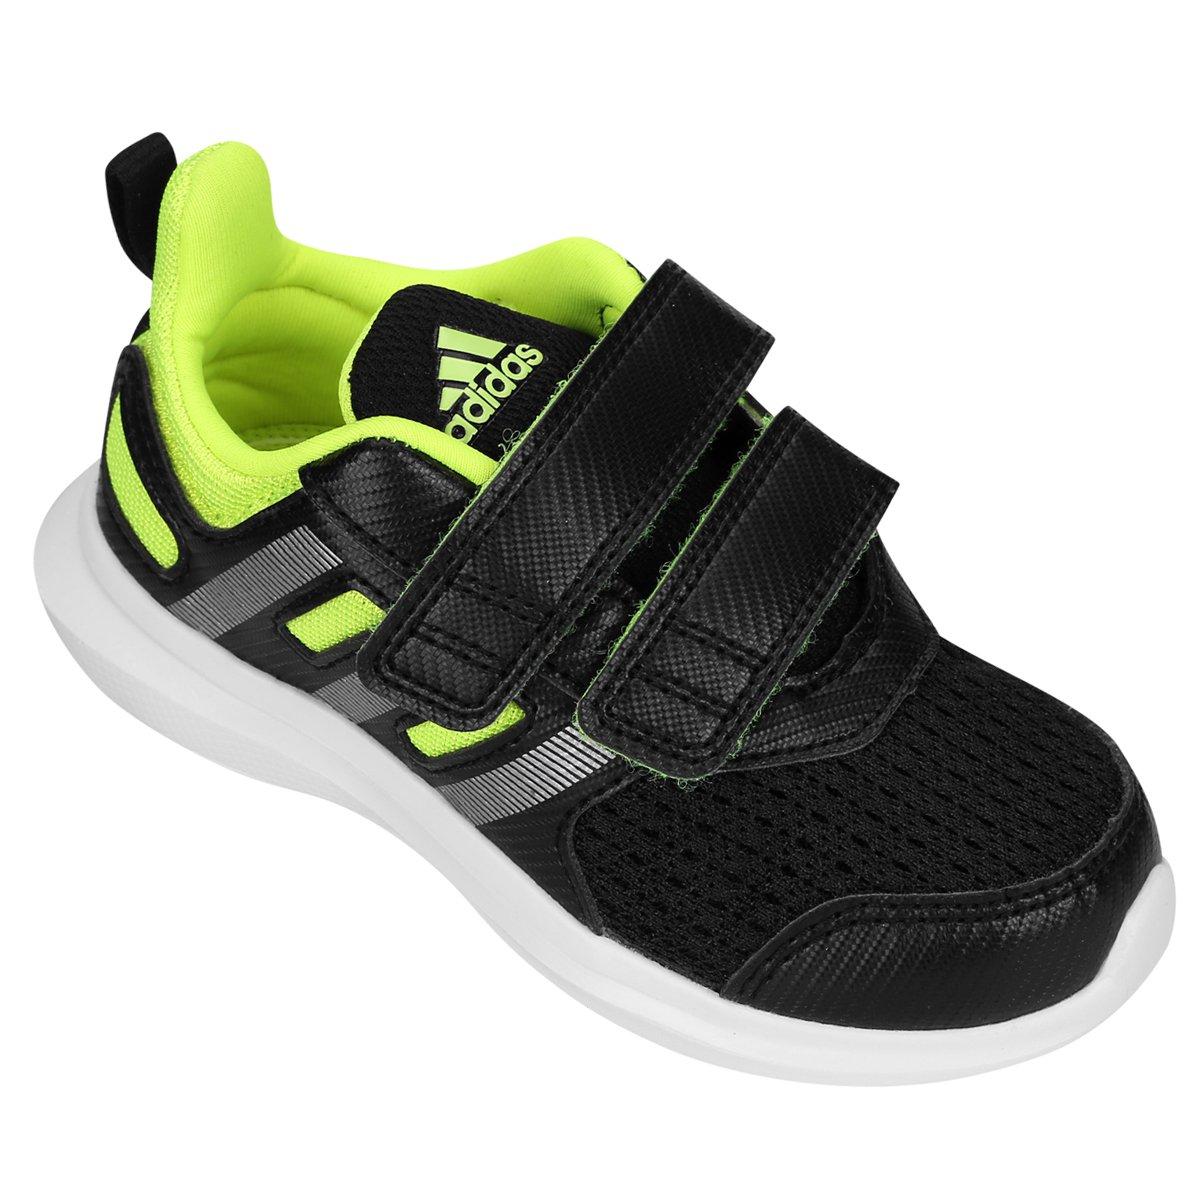 6272246fecd Tênis Adidas Hyperfast 2 Cf Infantil - Compre Agora